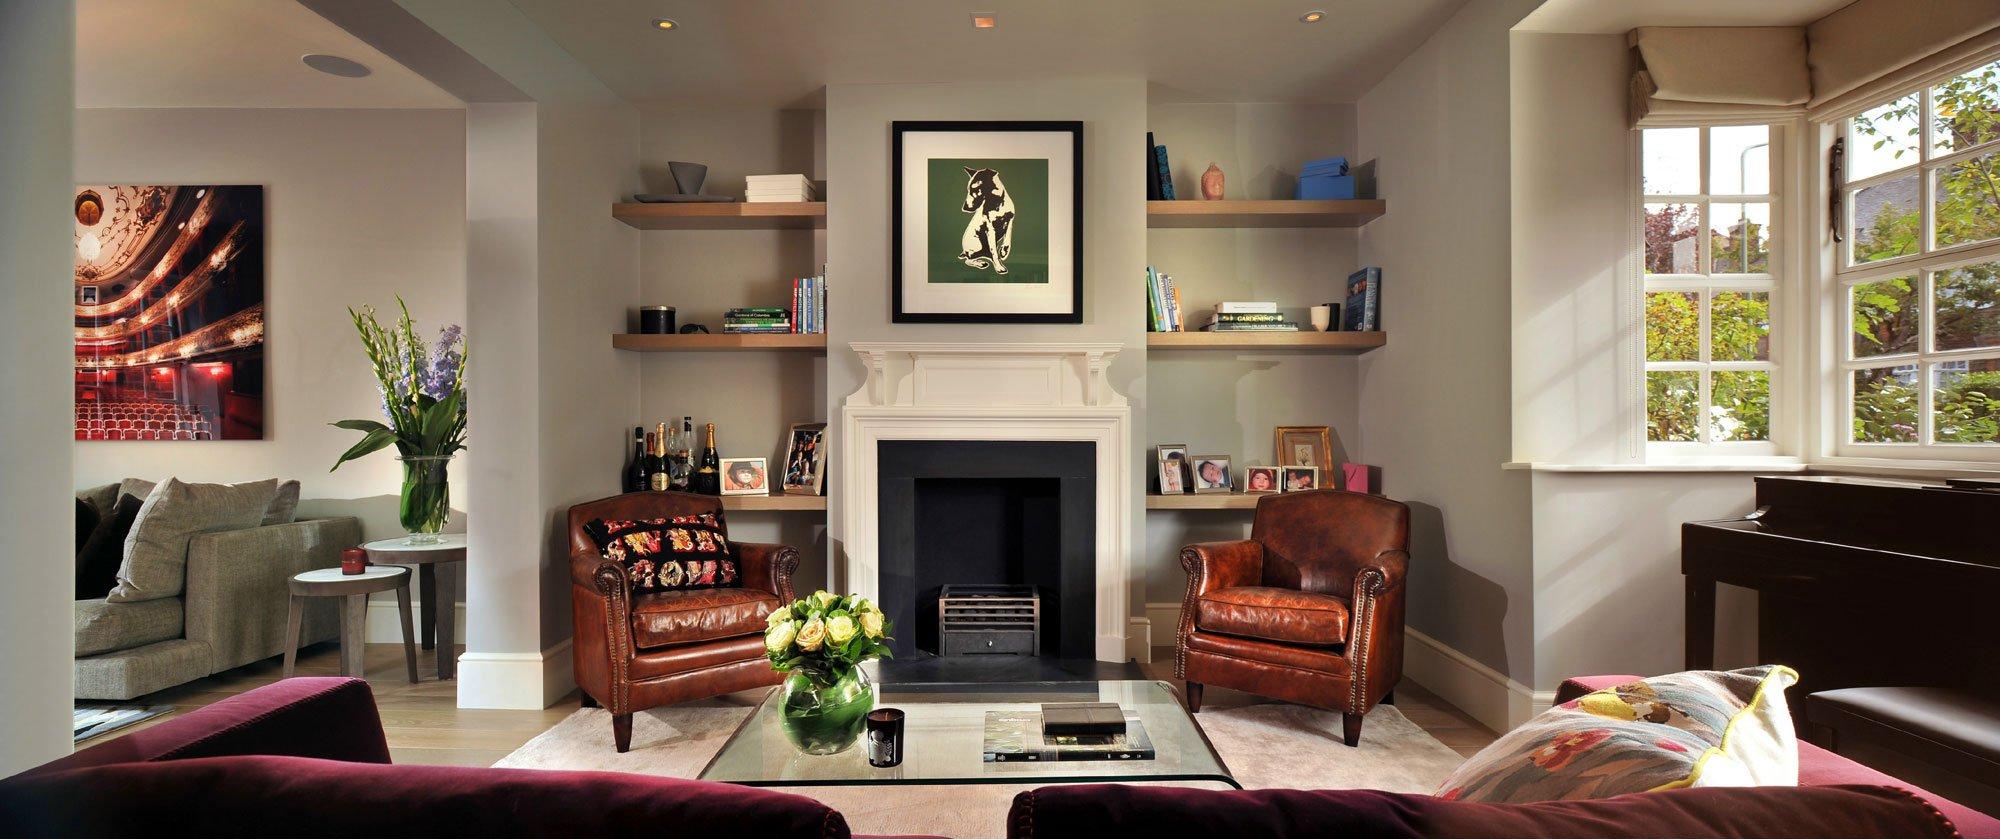 Hampstead-House-05